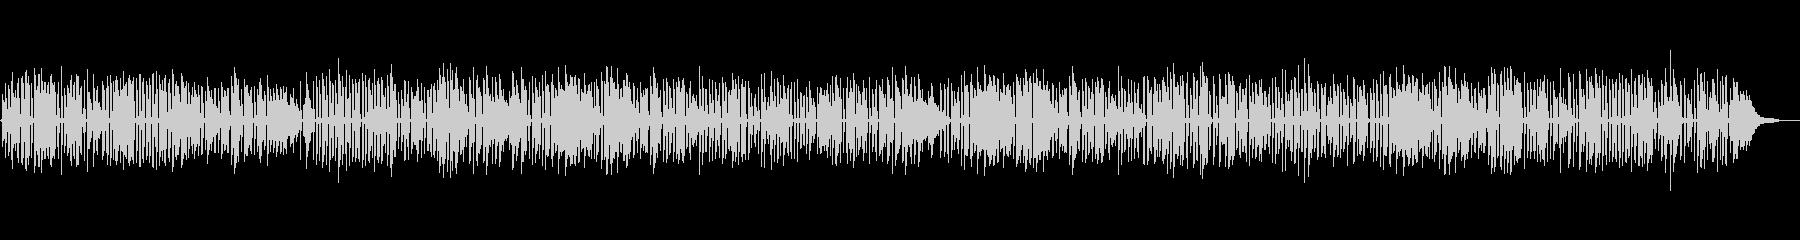 YouTube、軽快なジャズソロピアノの未再生の波形